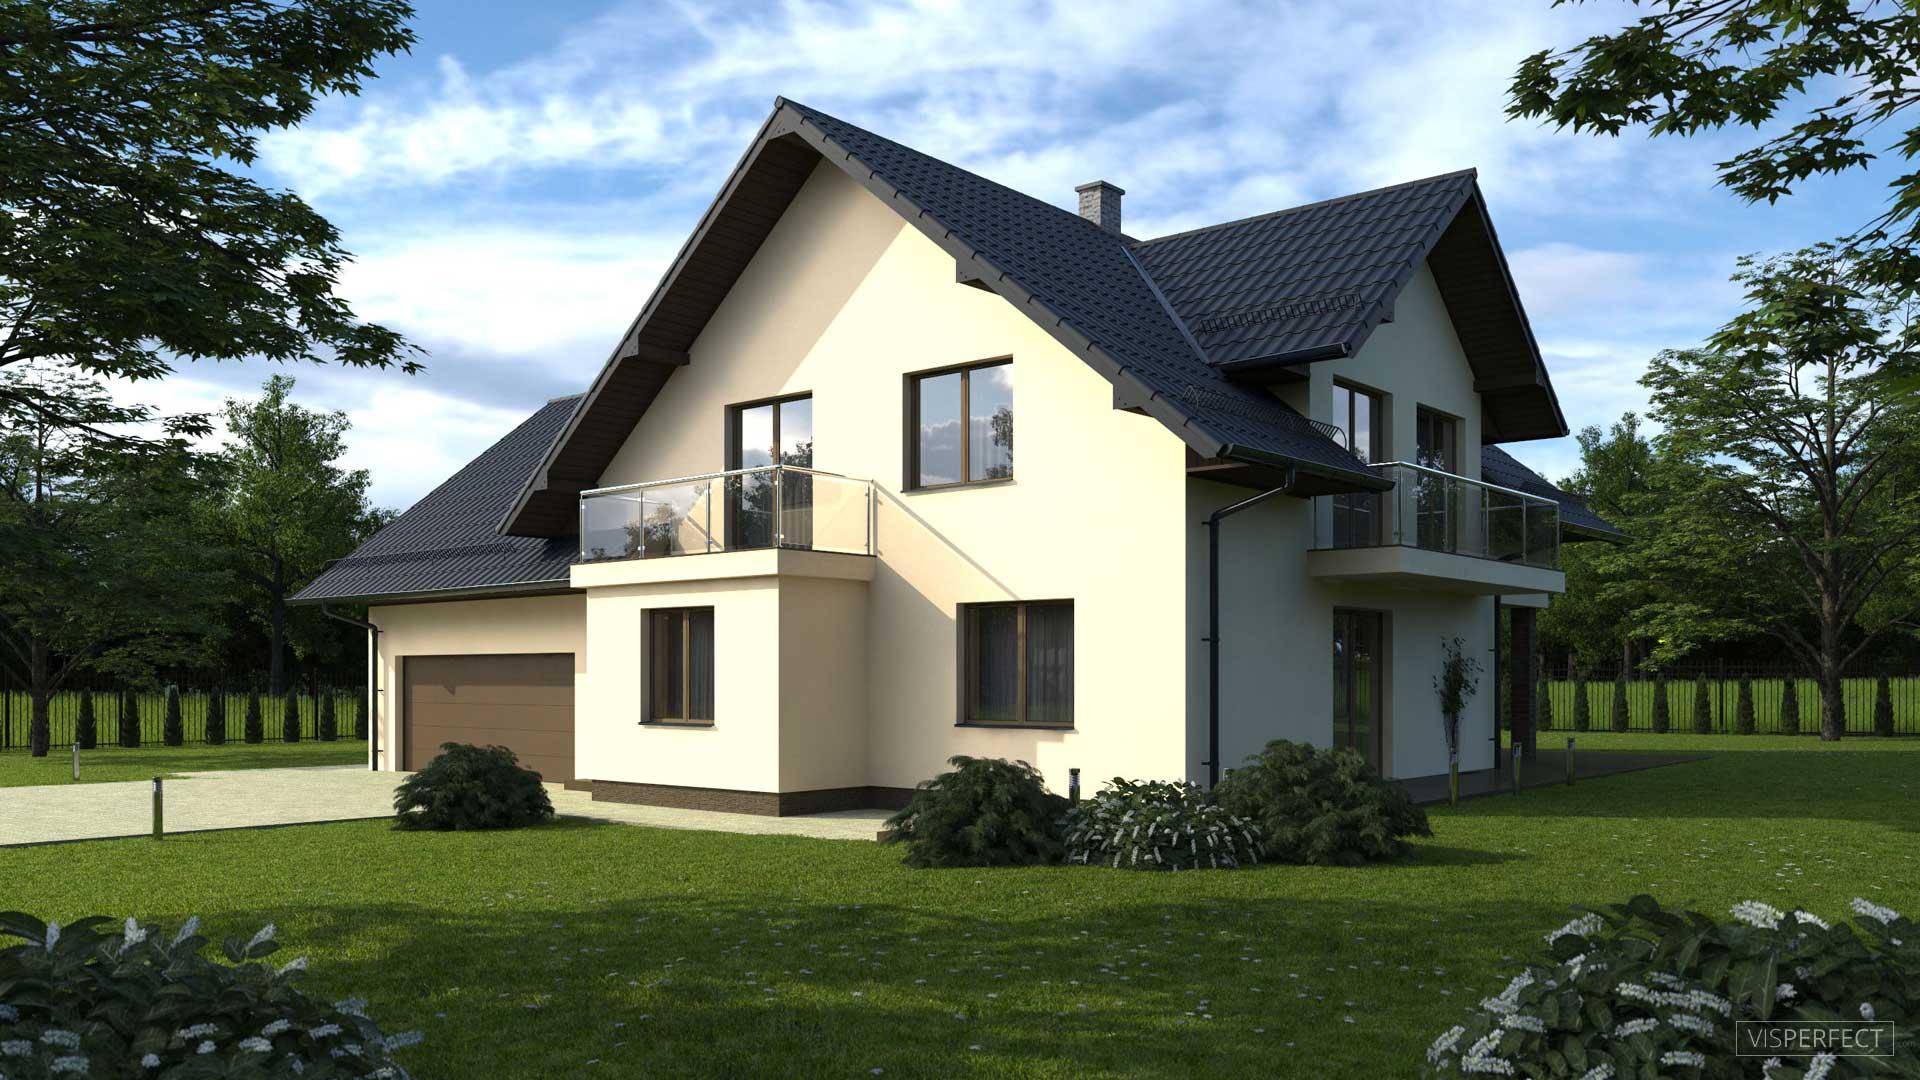 Detached house visualization 3D model